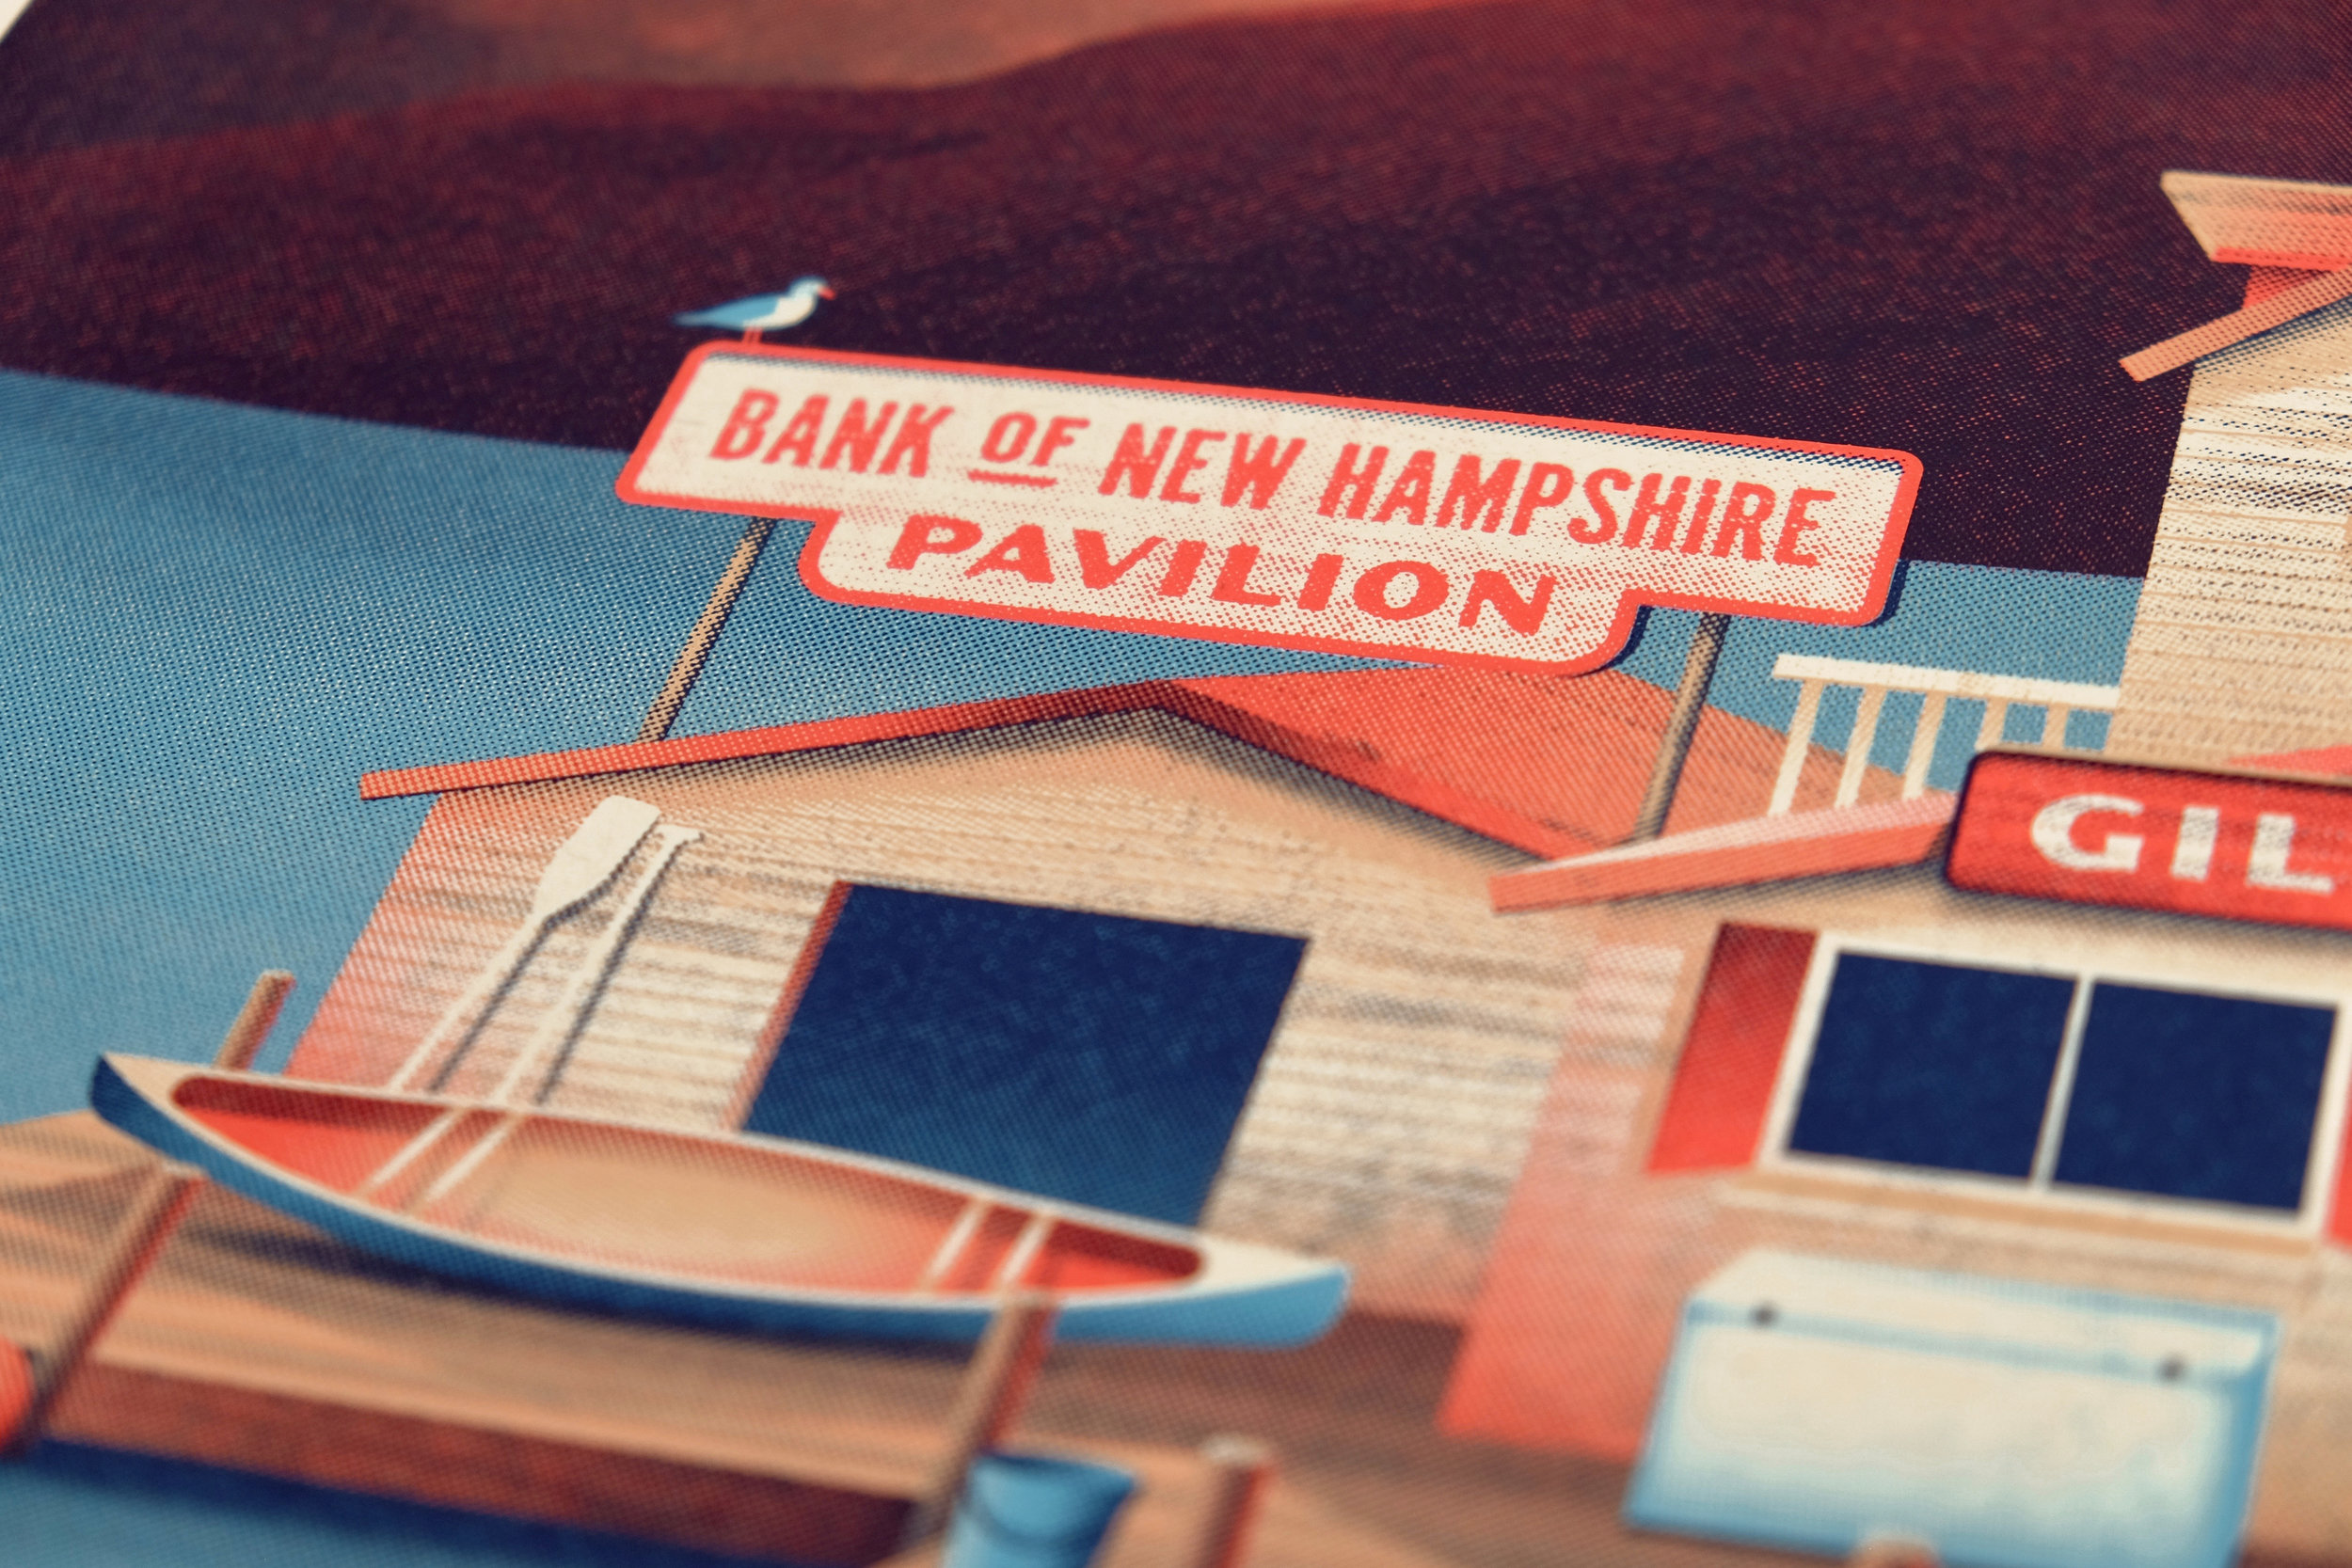 Dave Matthews Band Gilford, NH Poster by DKNG